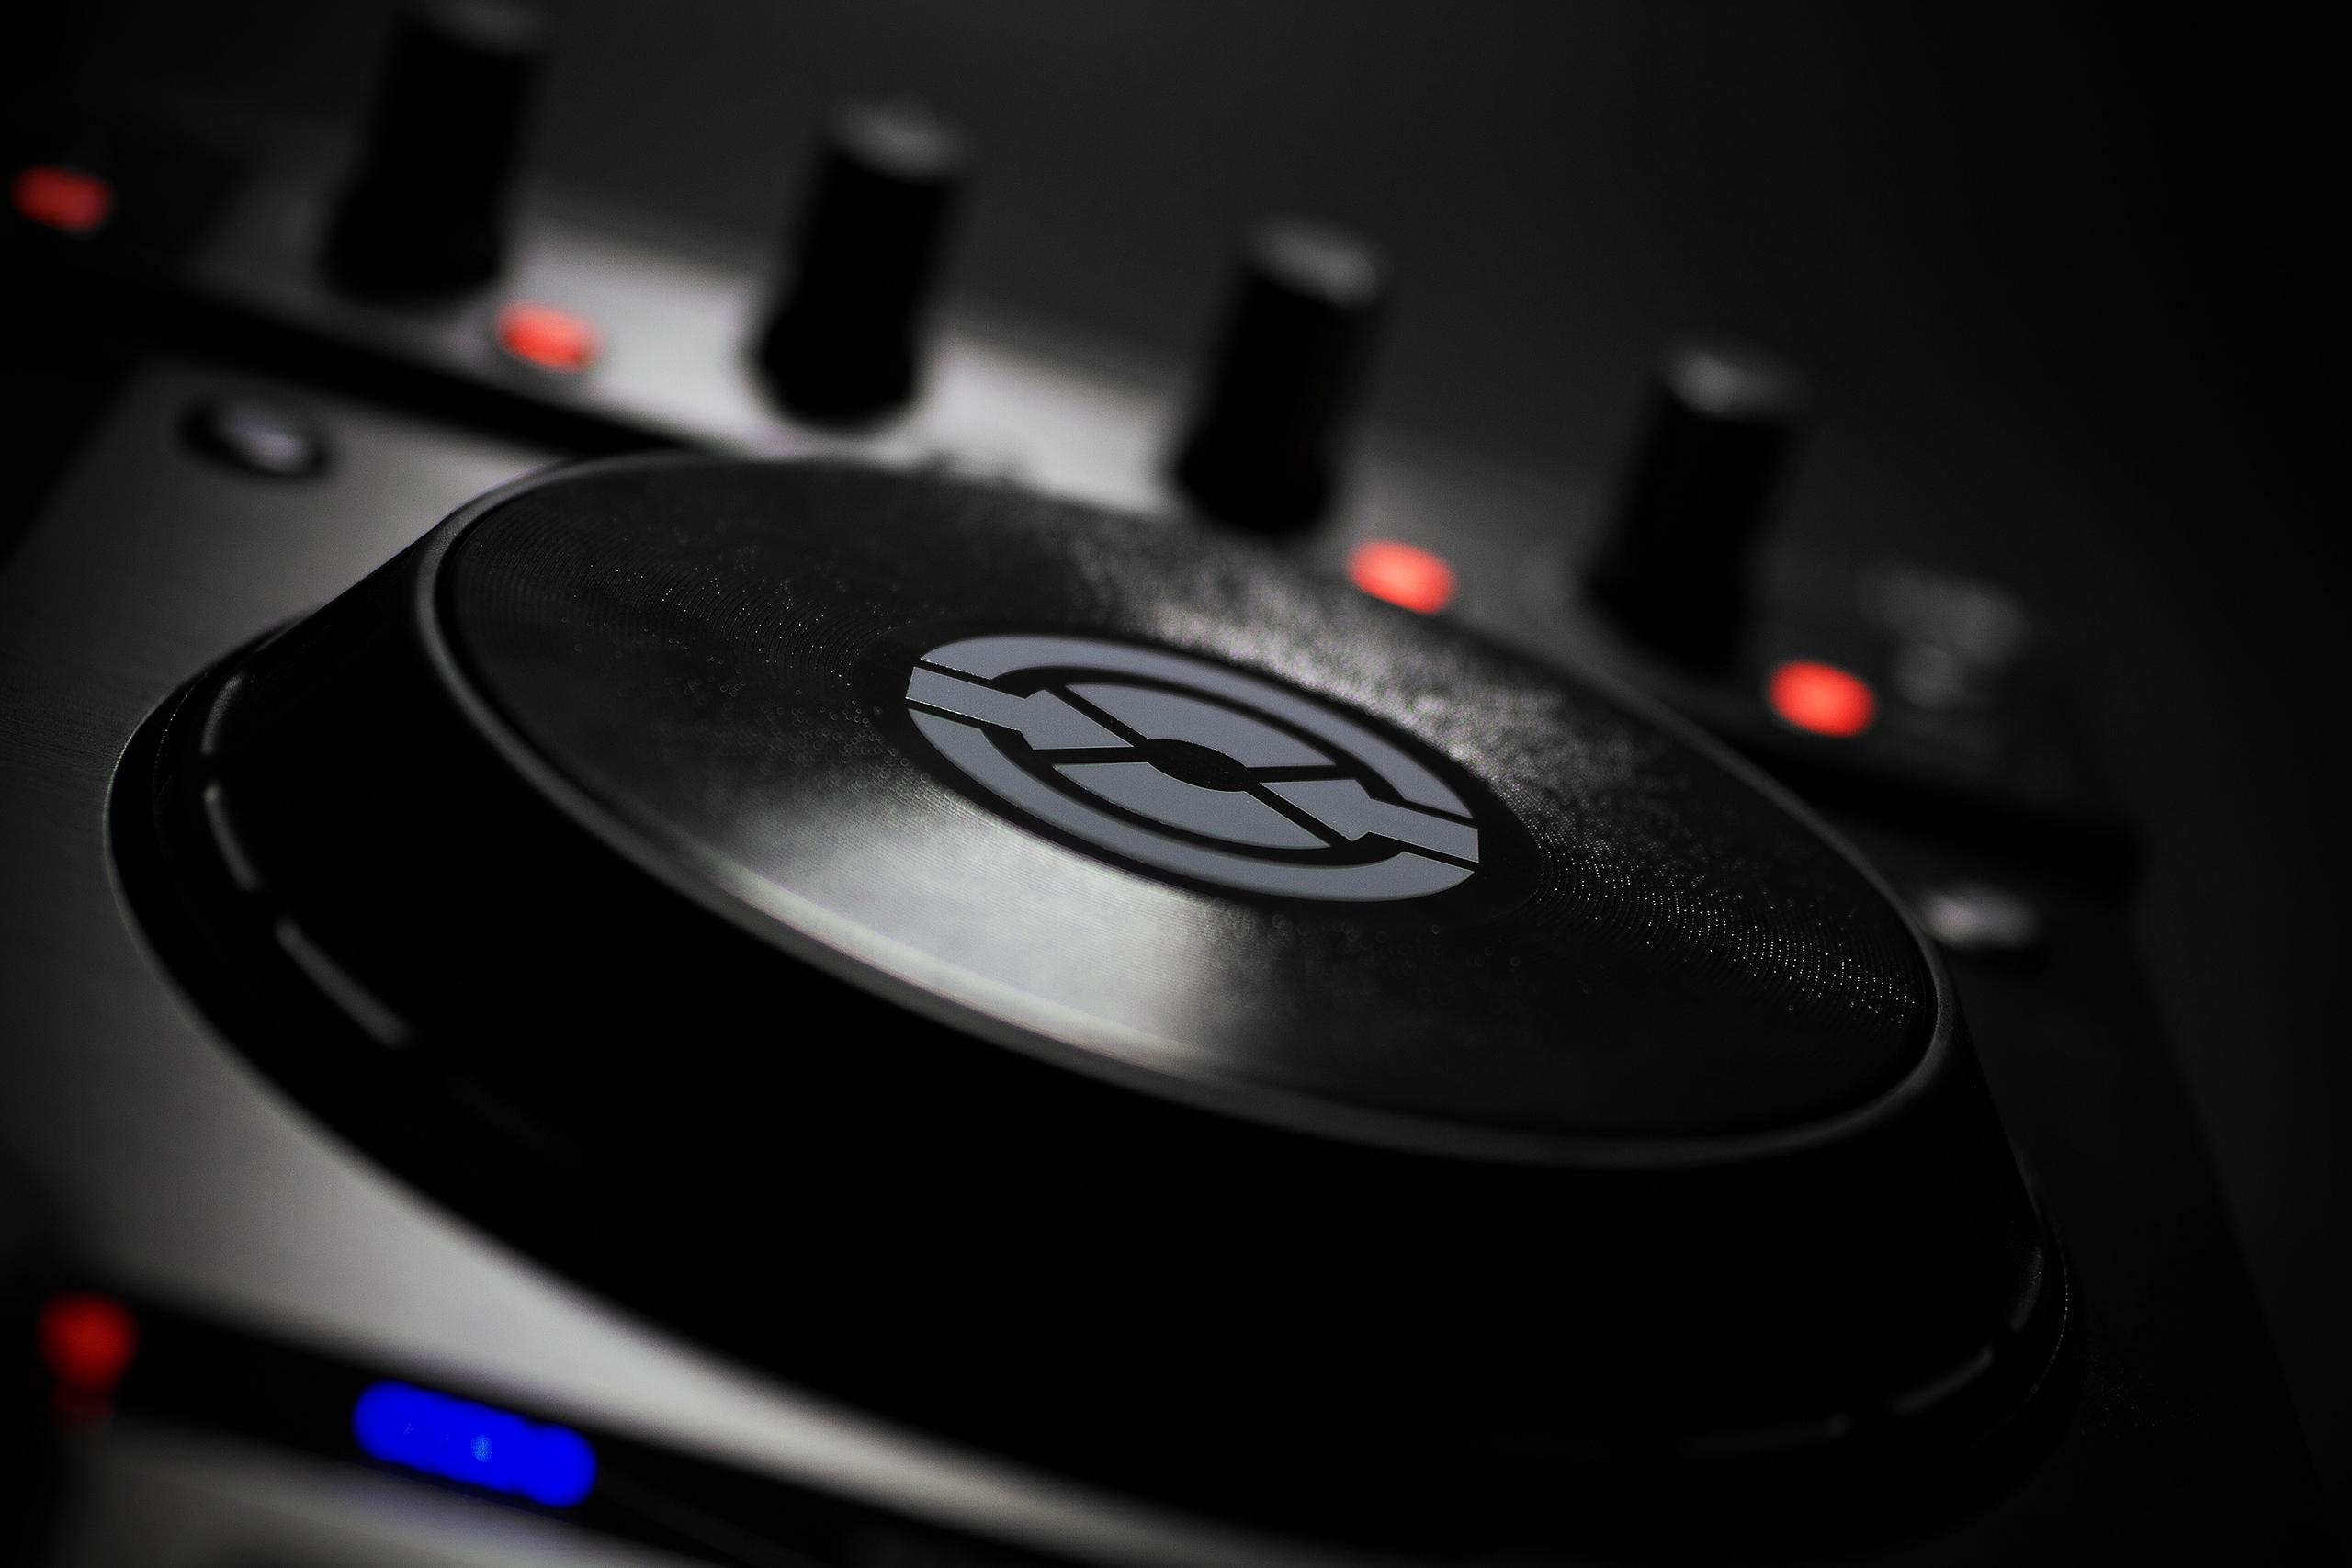 music, Instruments, DJ, X1, Flux, mk2, play, Ni, zoom, cue, Djing ...